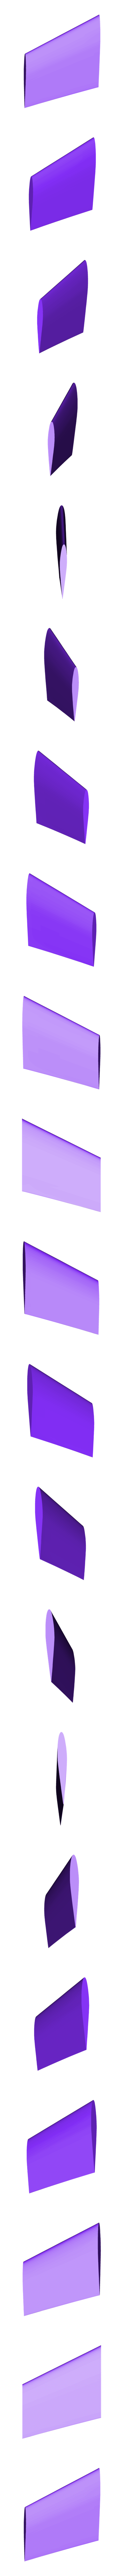 Wing2_L.STL Download STL file Phenom 300 • Template to 3D print, Eduardohbm